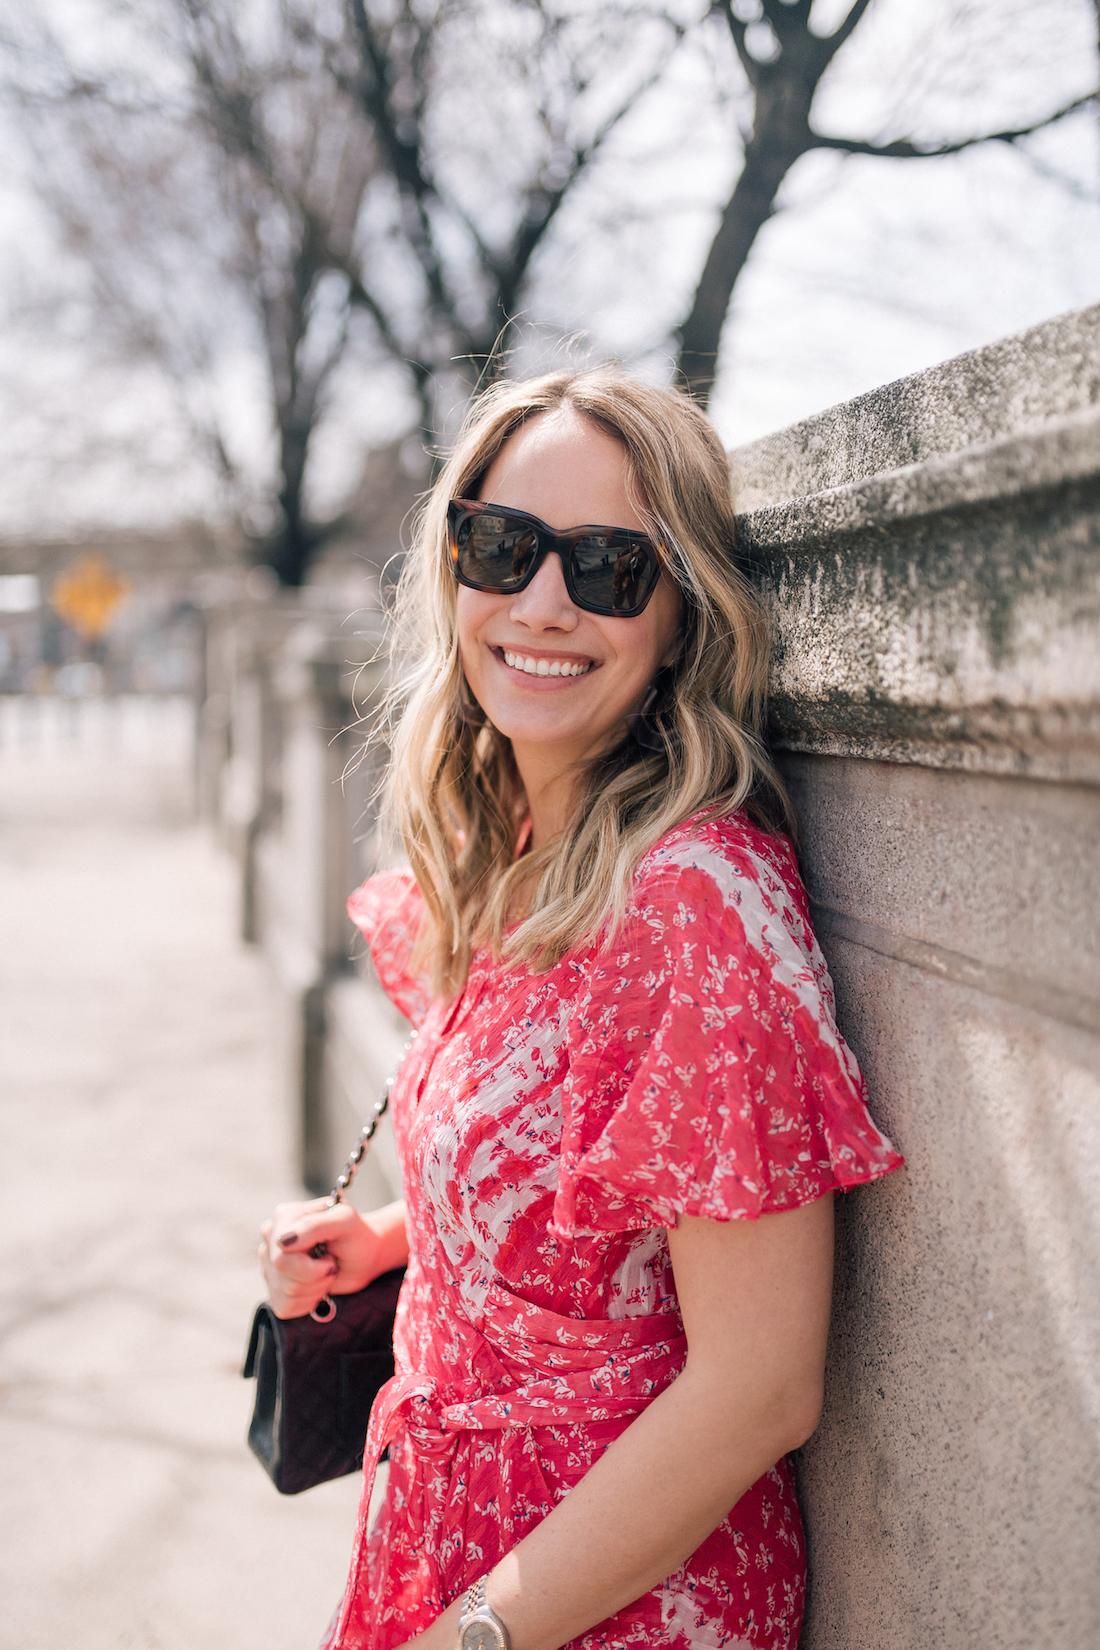 Grace Atwood is wearing Celine Sunglasses